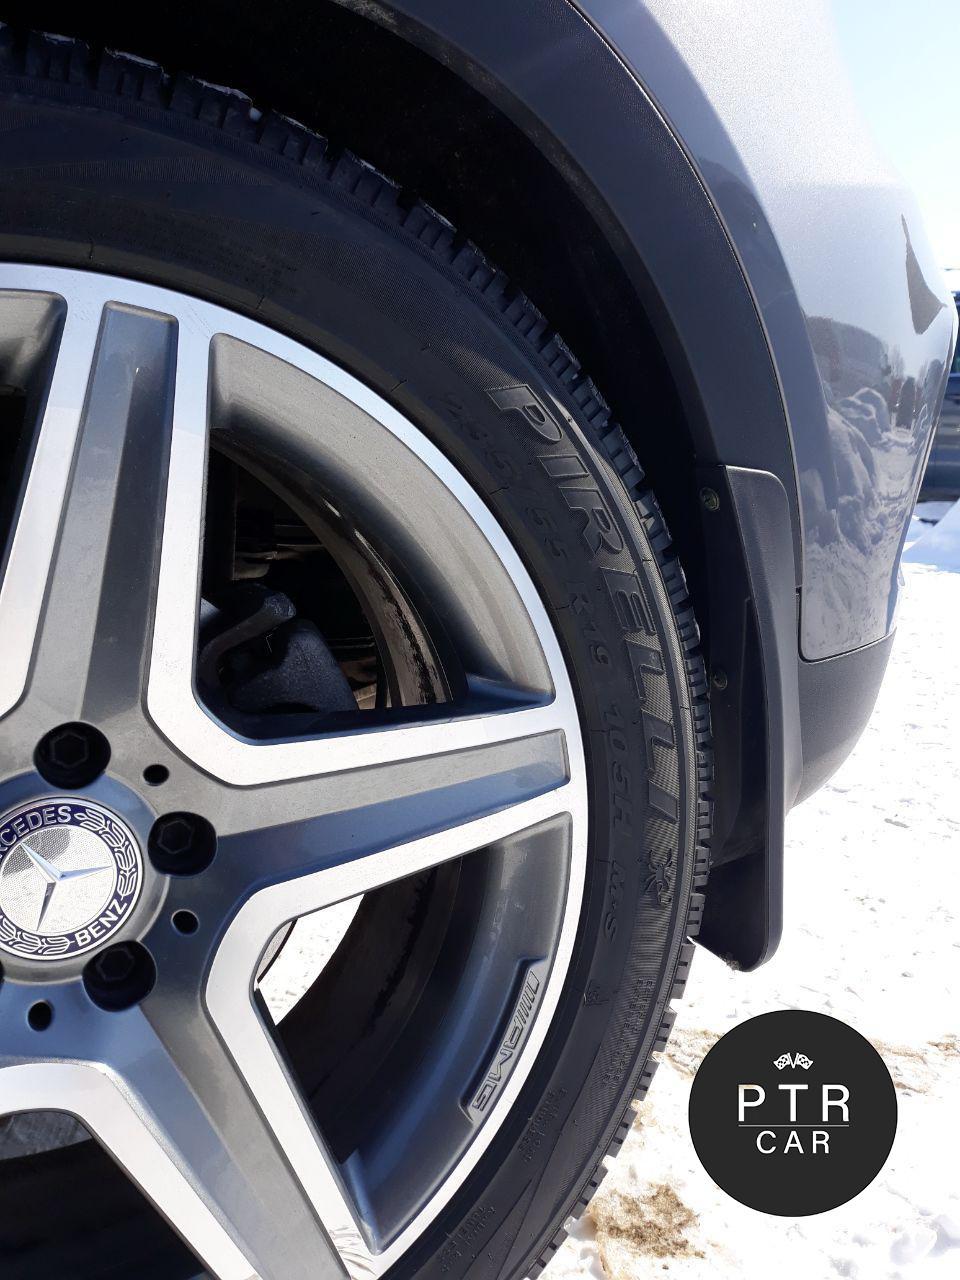 Брызговики Mercedes GLE 166 2015- SUV AMG - без порогов (полный кт-4 шт)